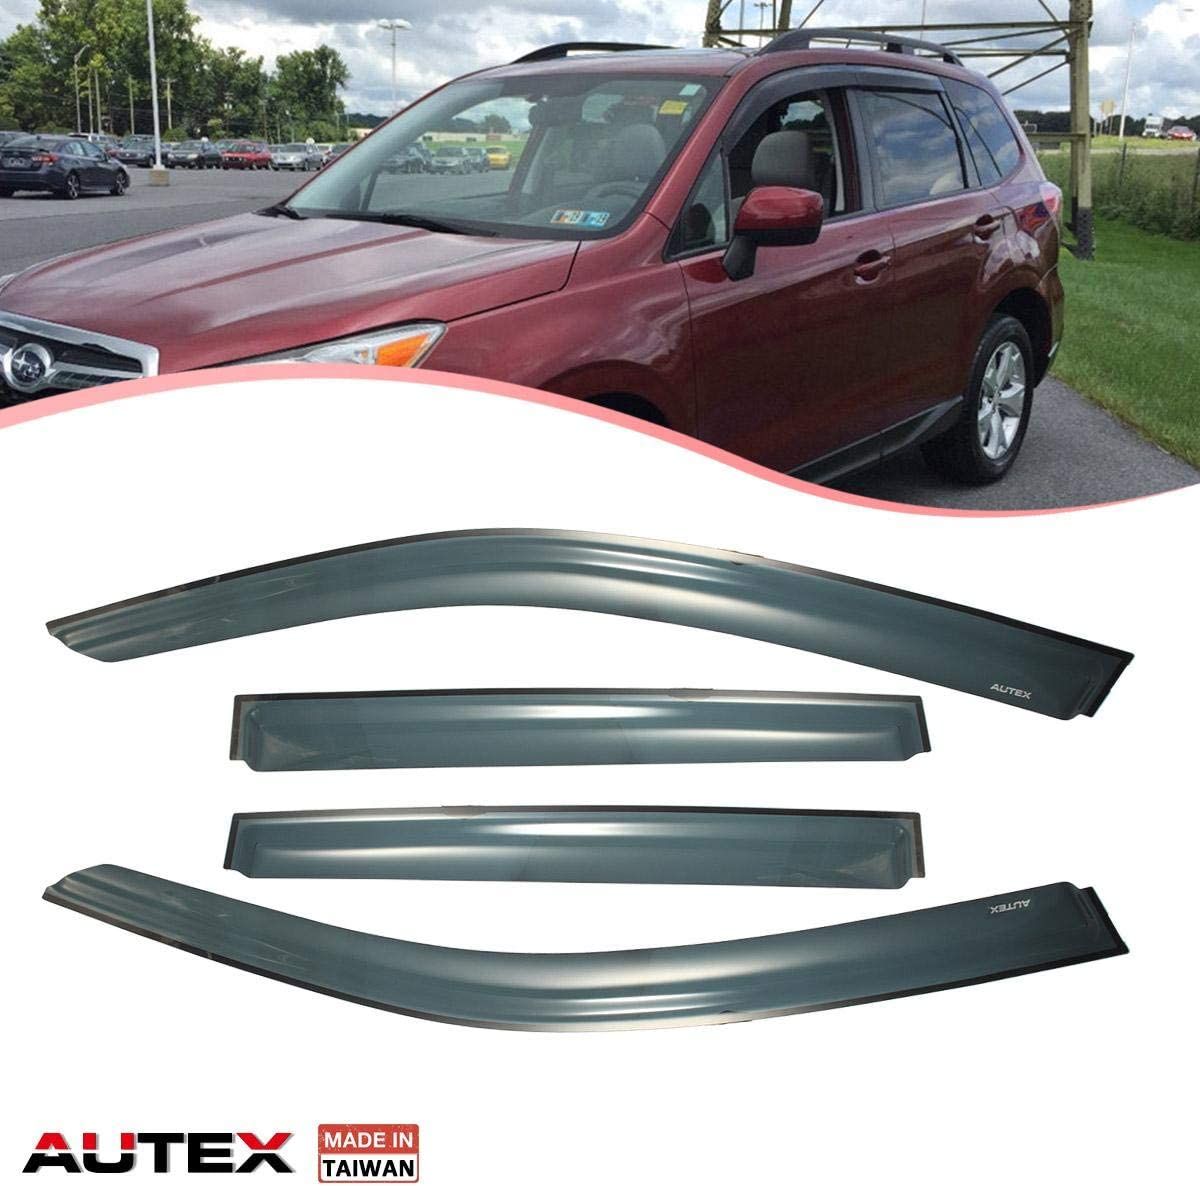 4-Piece Set for 2014-2018 Subaru Forester Auto Ventshade 194375 In-Channel Ventvisor Side Window Deflector